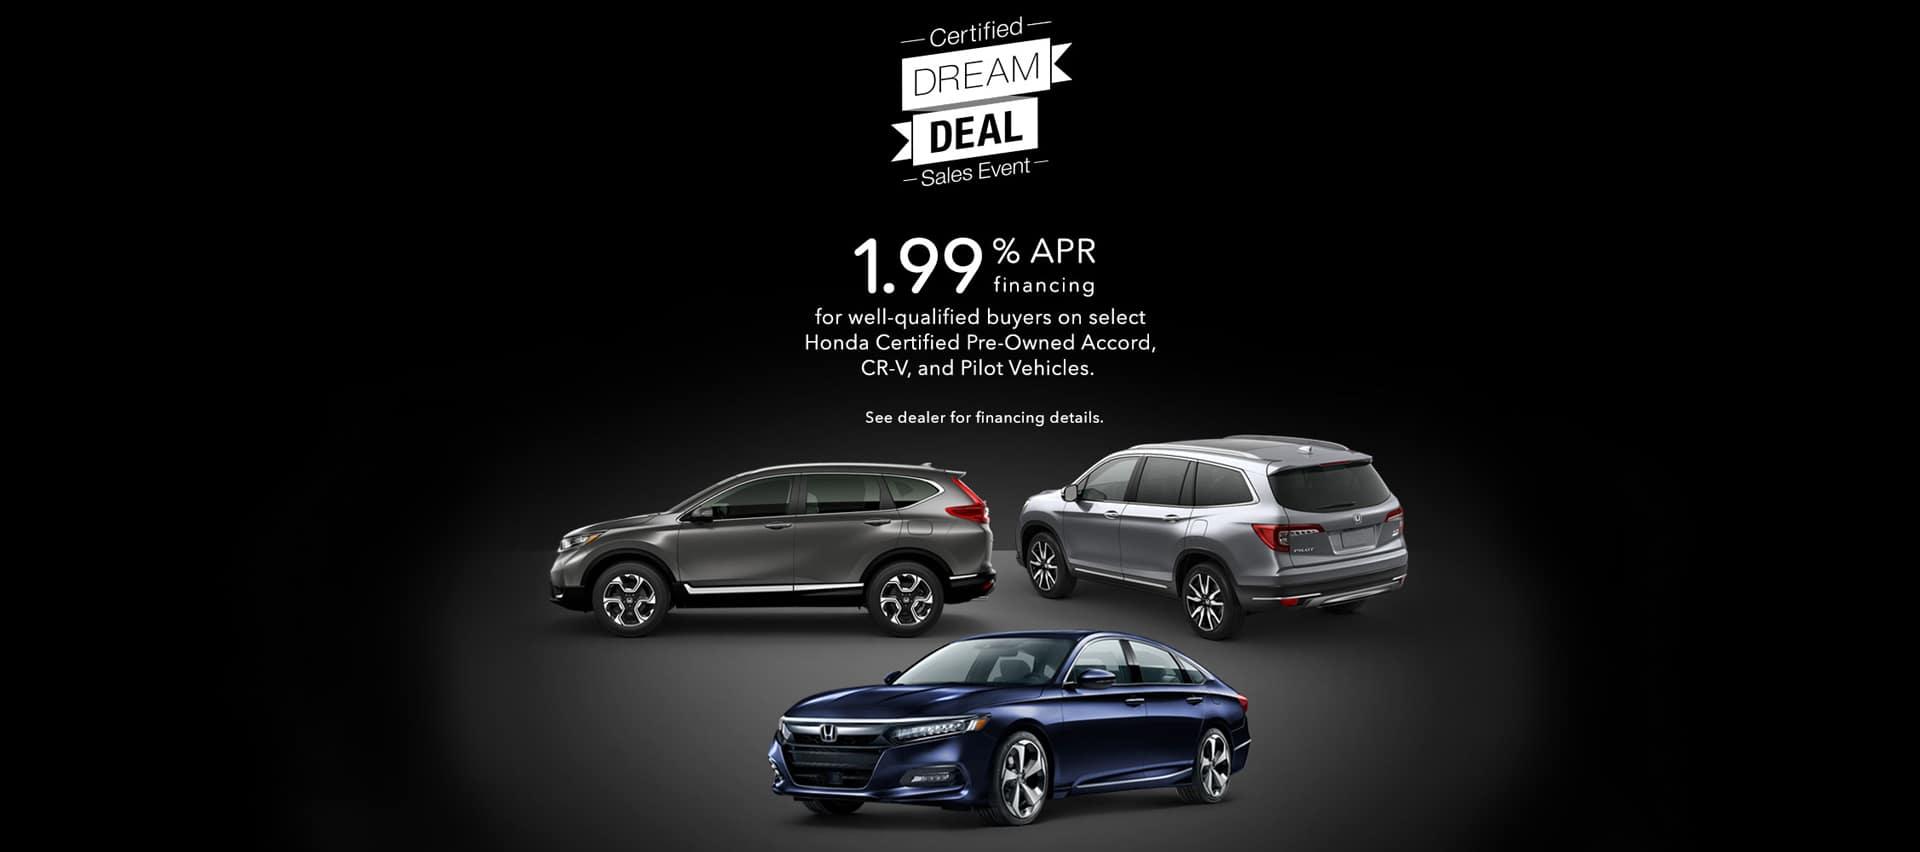 Honda Certified Dream Deal Event